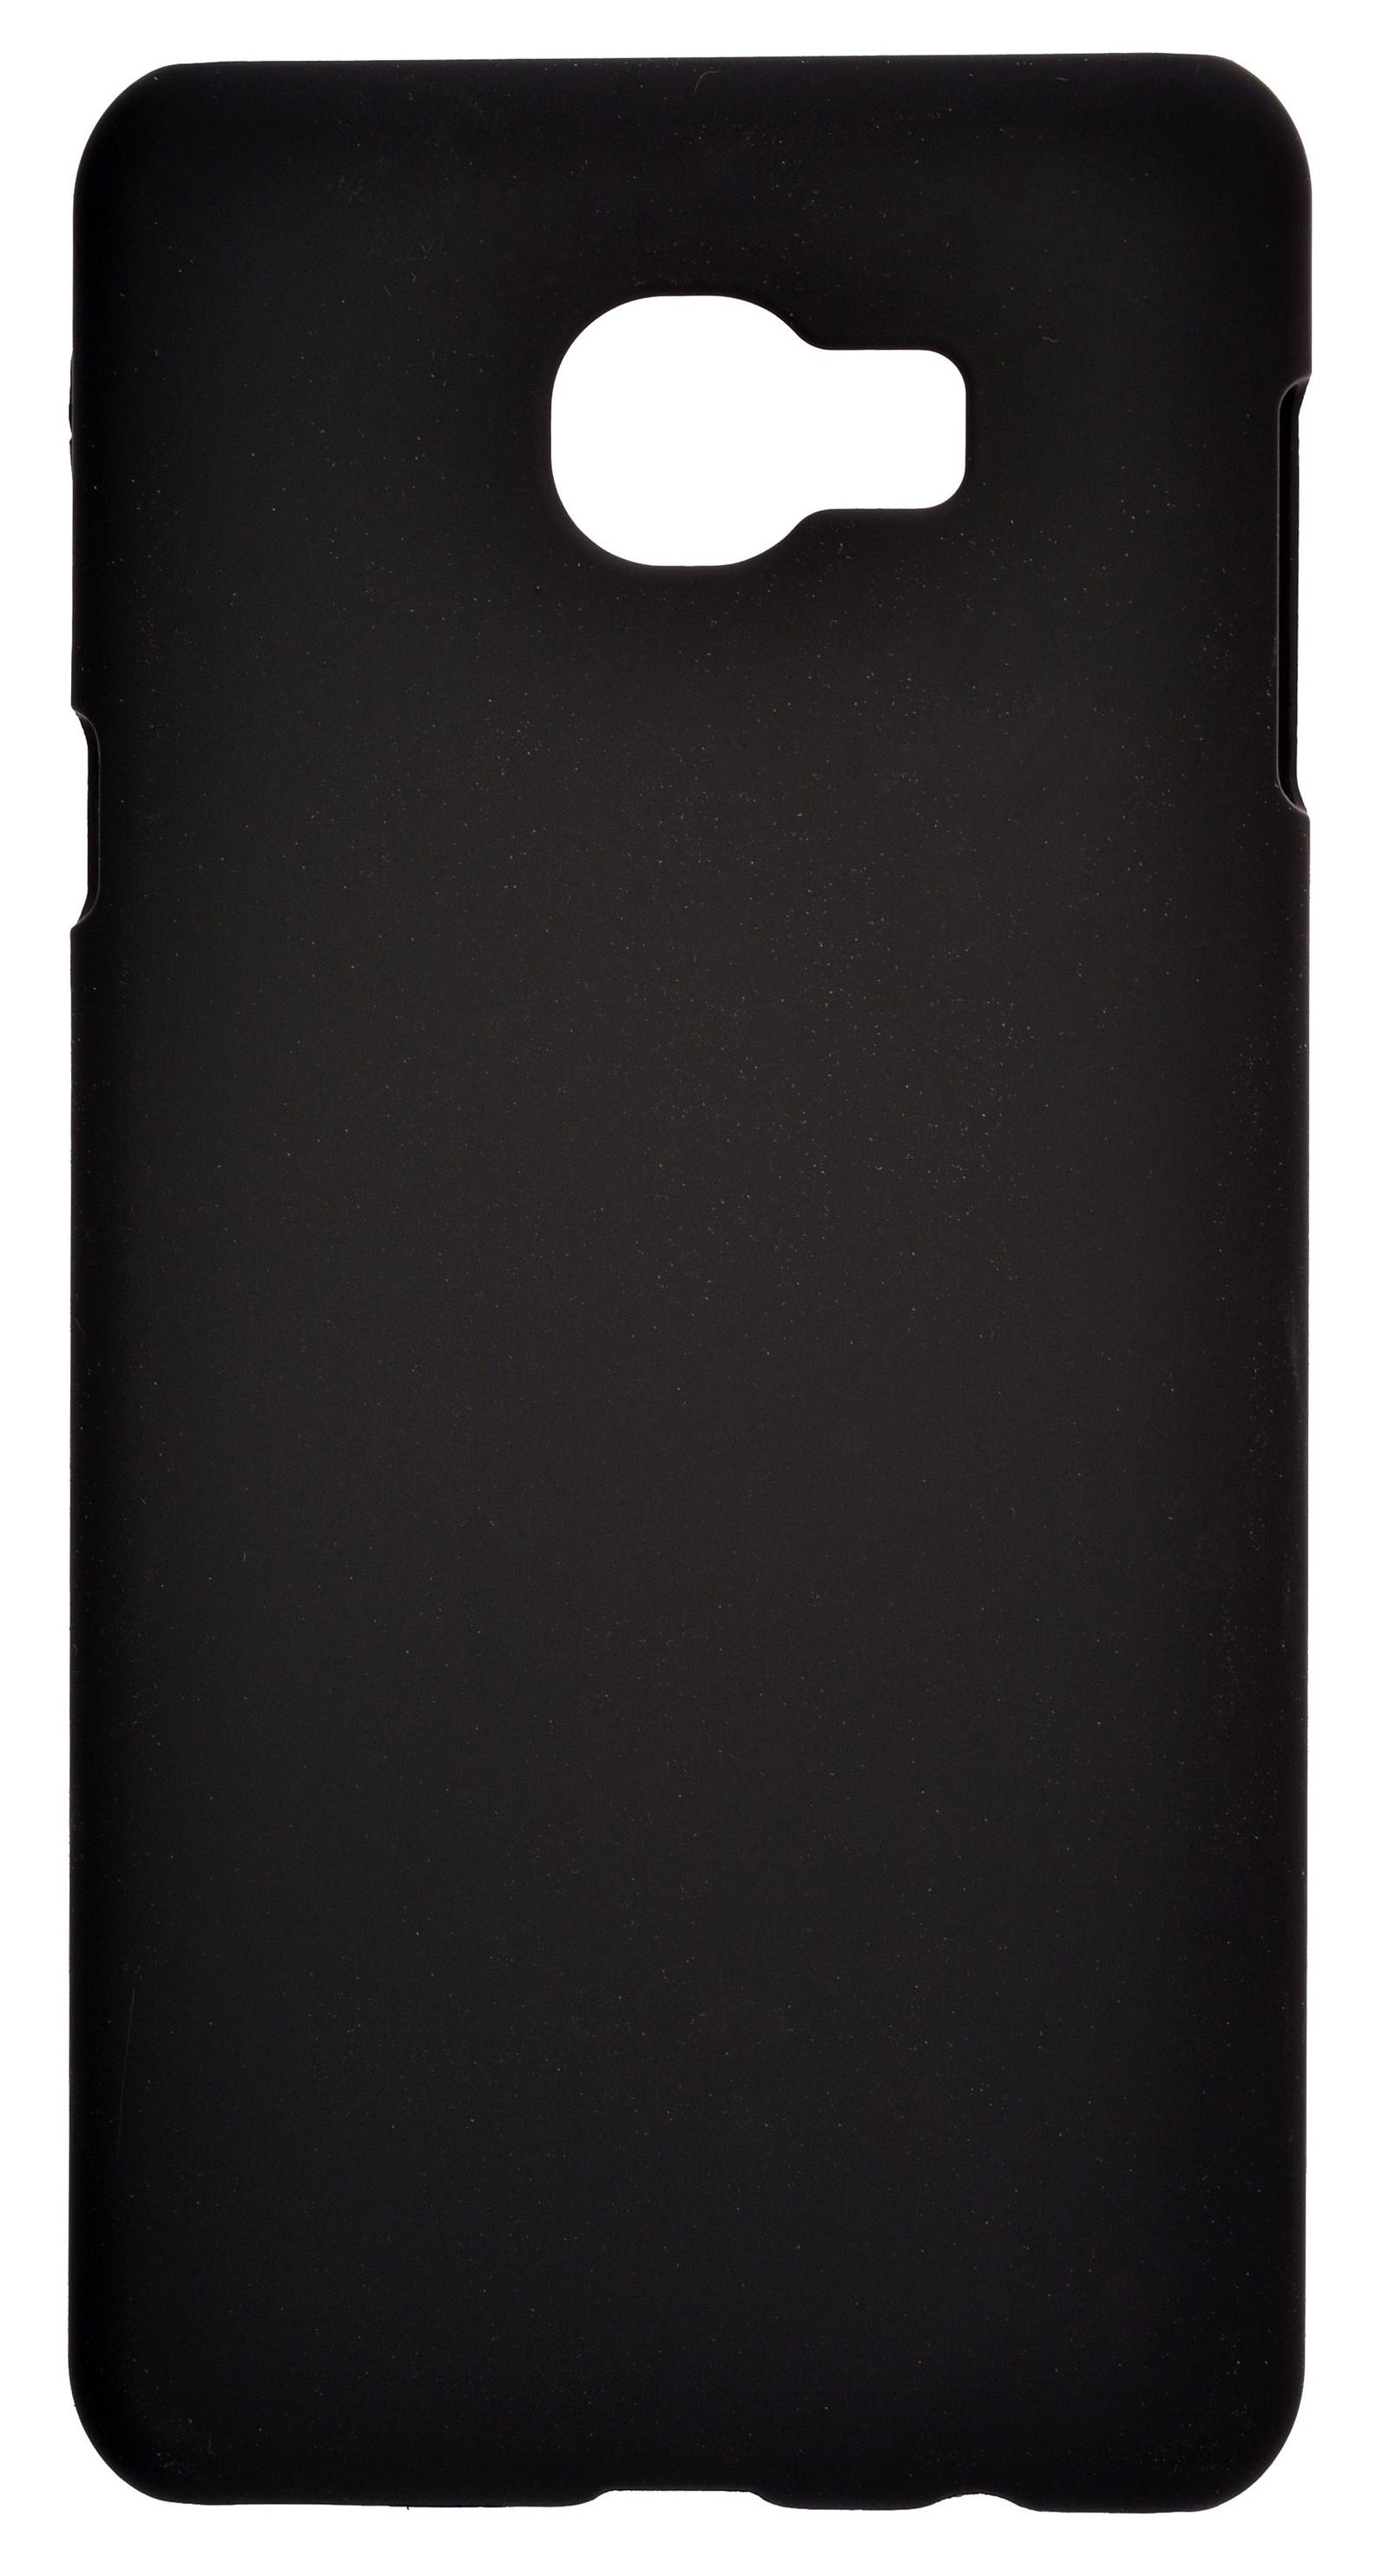 Накладка Skinbox для Samsung Galaxy C7, 2000000107035, черный leather case horse skin pattern for galaxy c7 c700 white